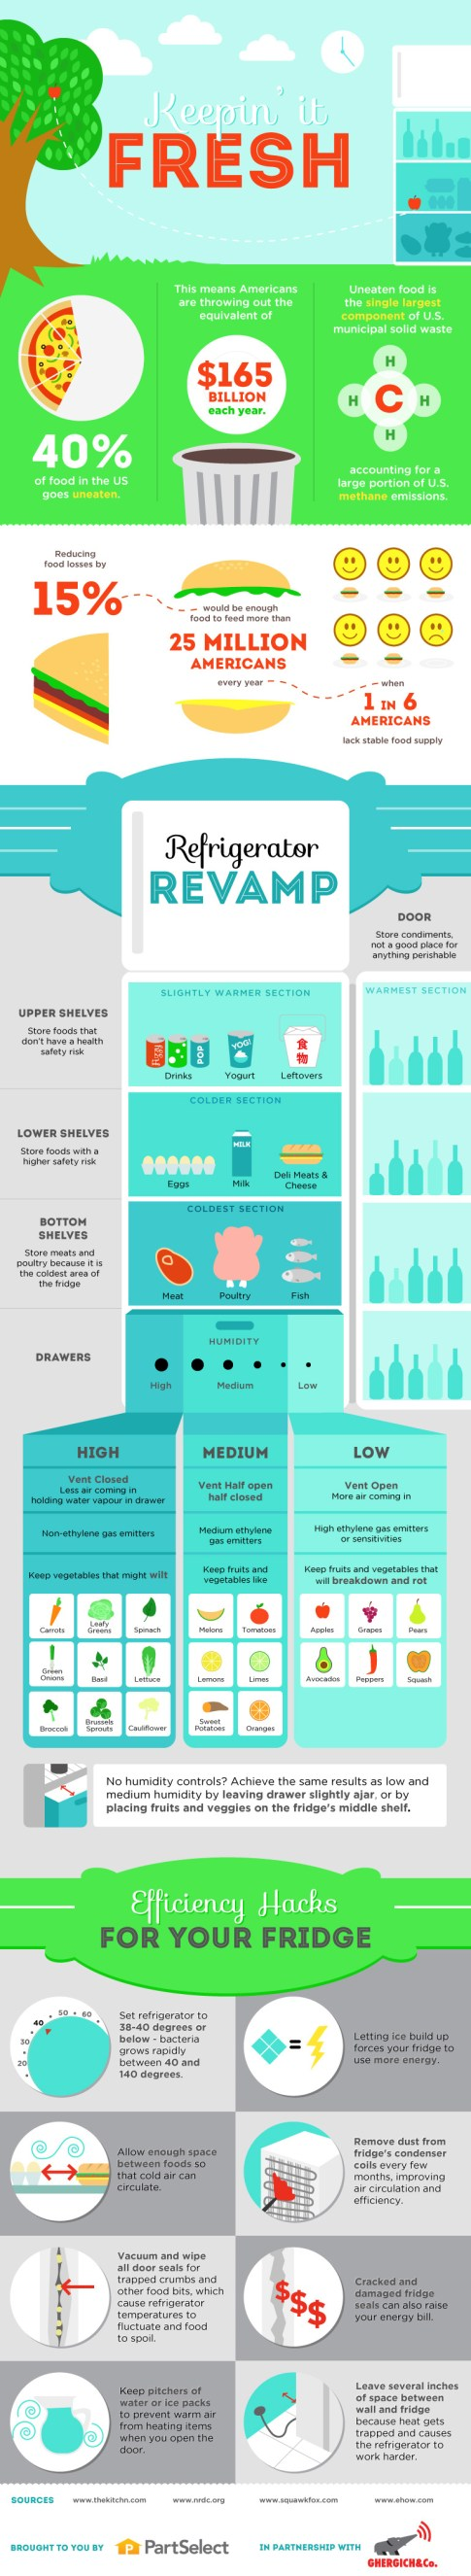 Make your refrigerator more efficient!